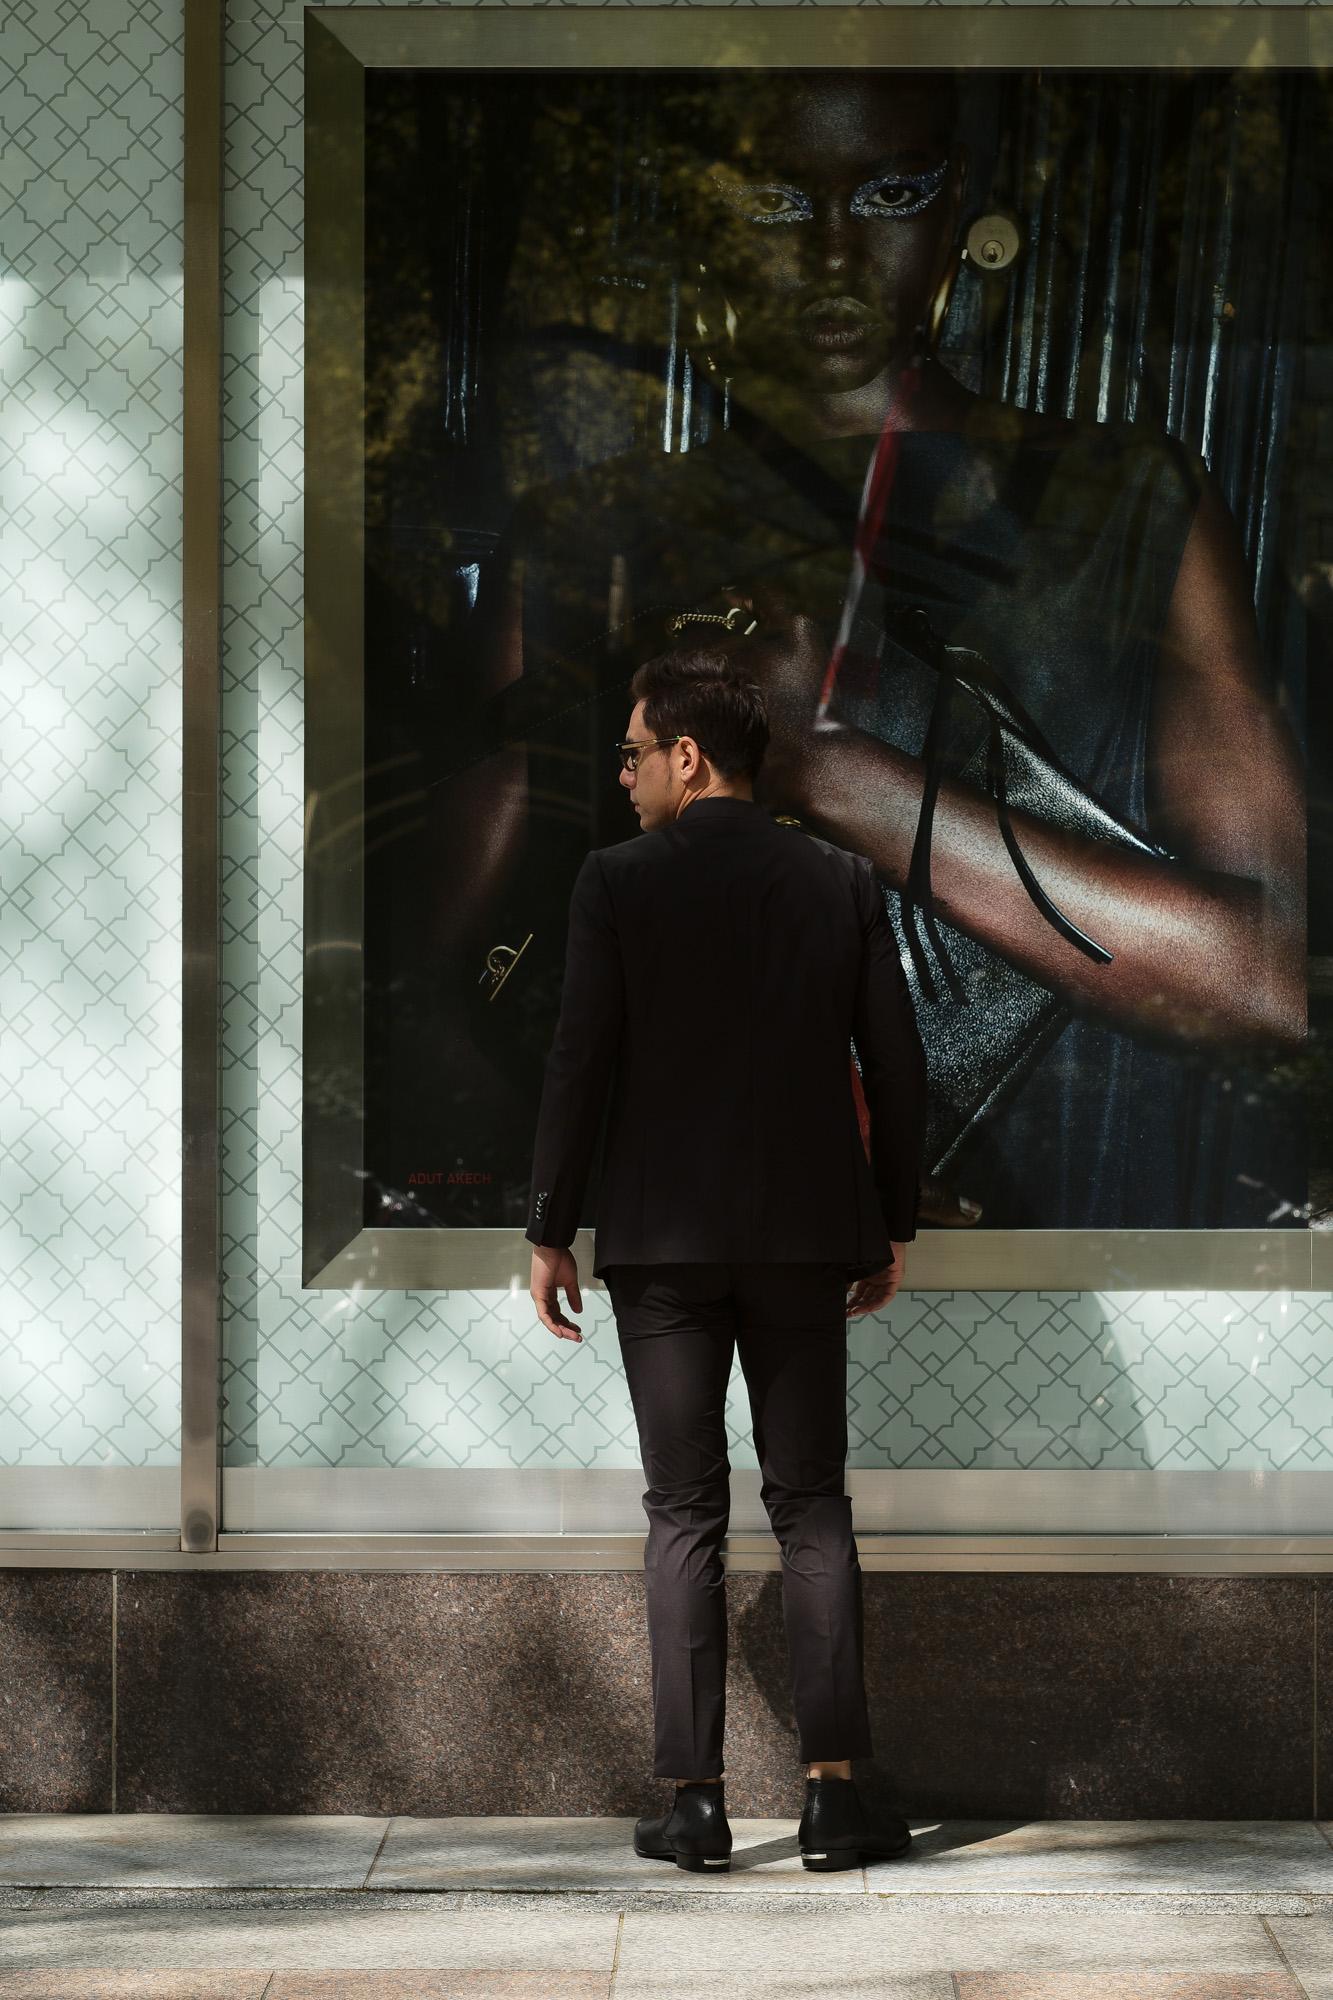 Cuervo (クエルボ) Sartoria Collection (サルトリア コレクション) Rooster (ルースター) STRETCH NYLON ストレッチナイロン スーツ BLACK(ブラック) MADE IN JAPAN (日本製) 2019 春夏 【ご予約受付中】  愛知 名古屋 alto e diritto アルトエデリット